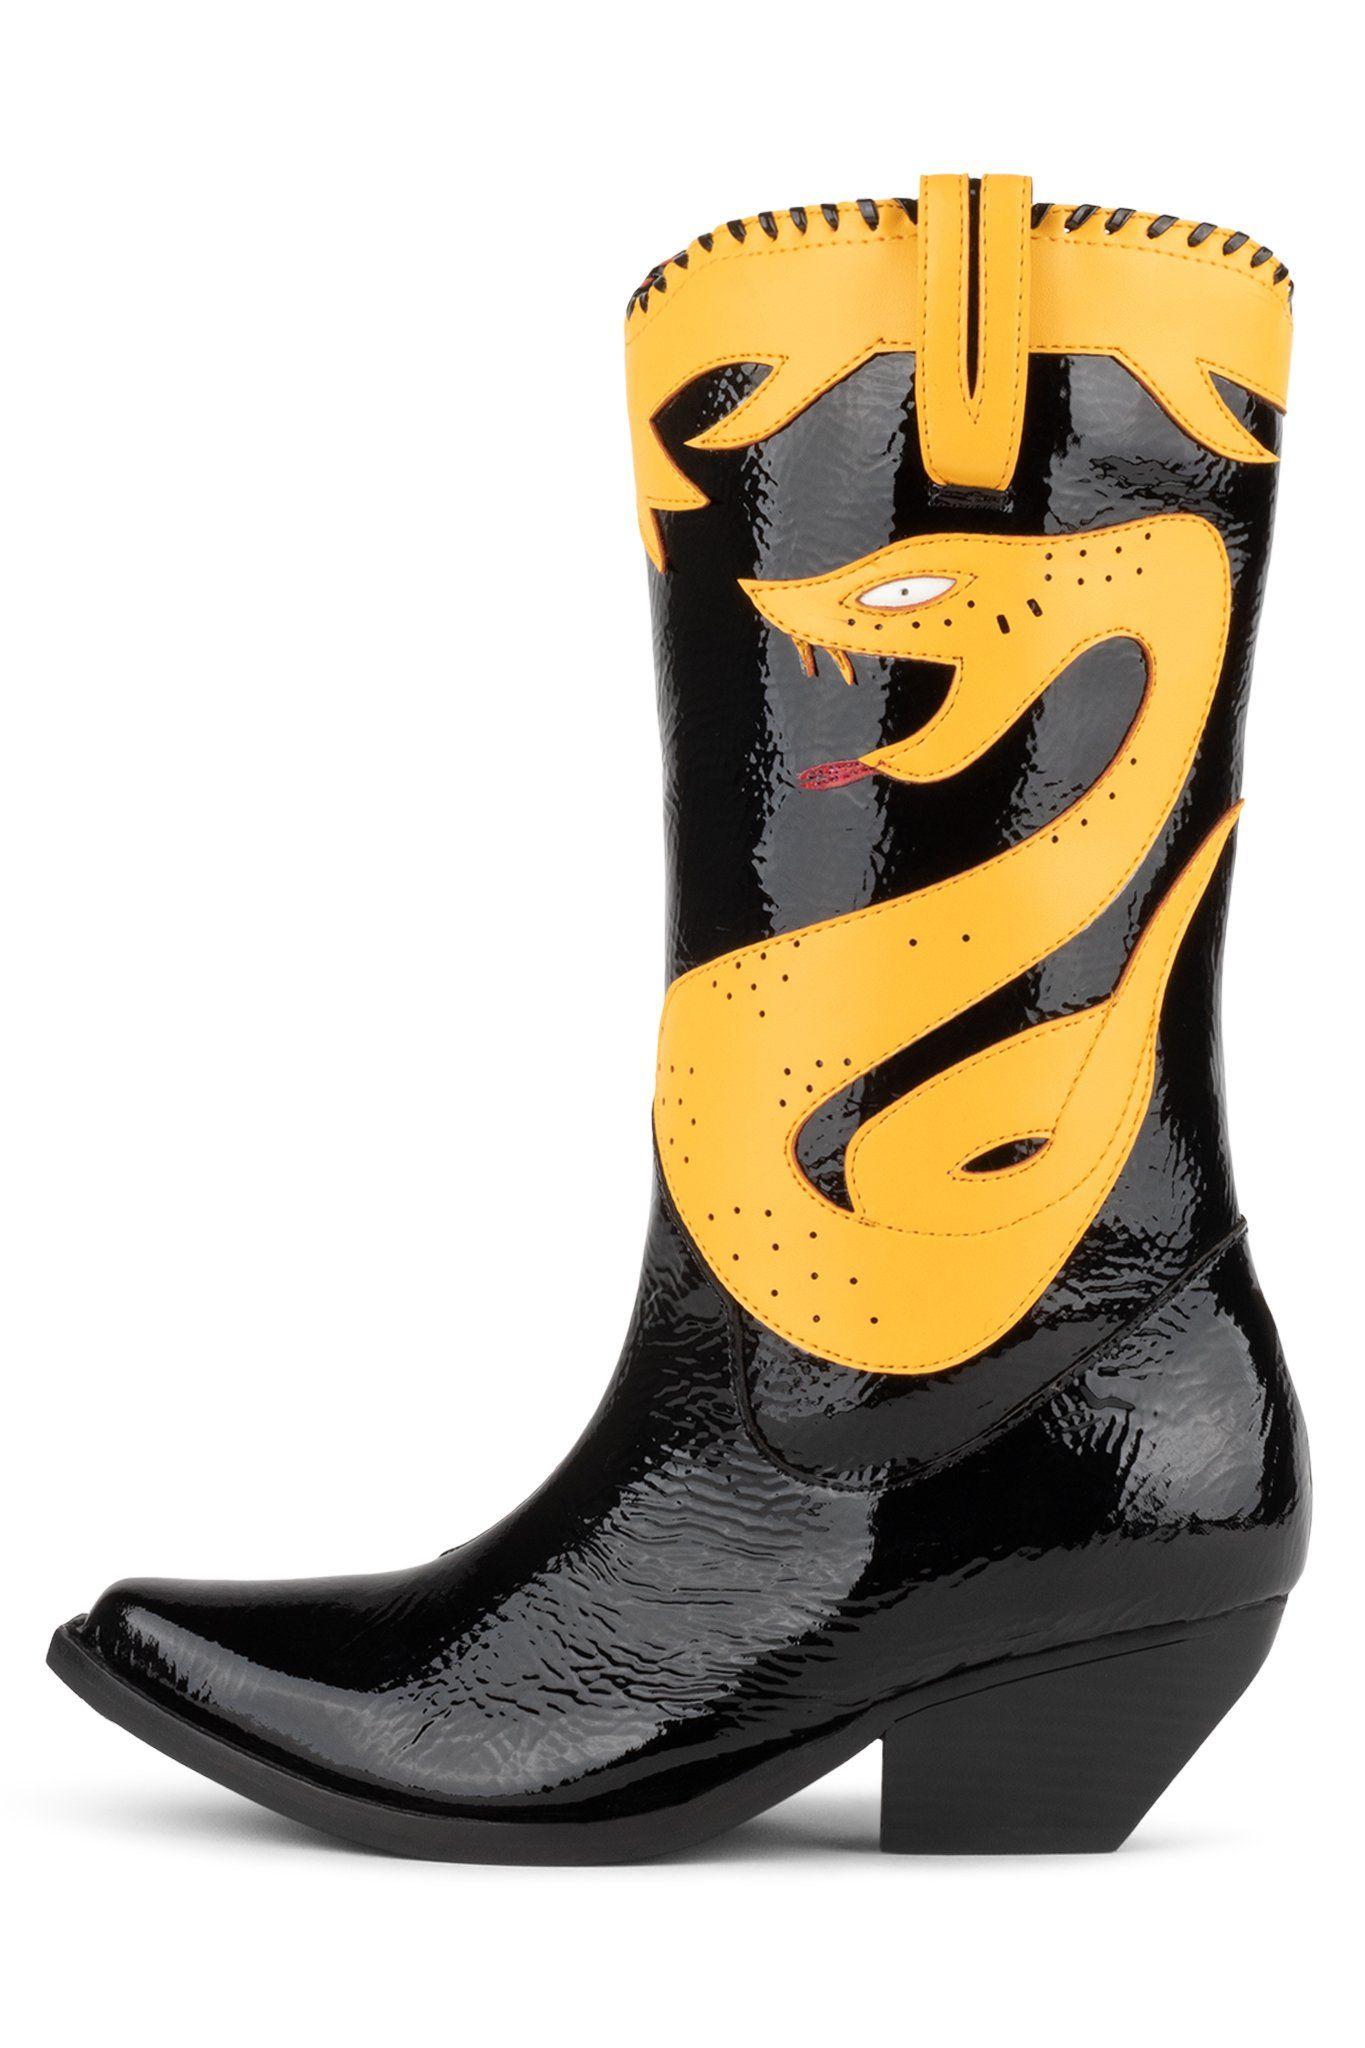 Kllrcobra Boots, Western boots, Mid calf boots